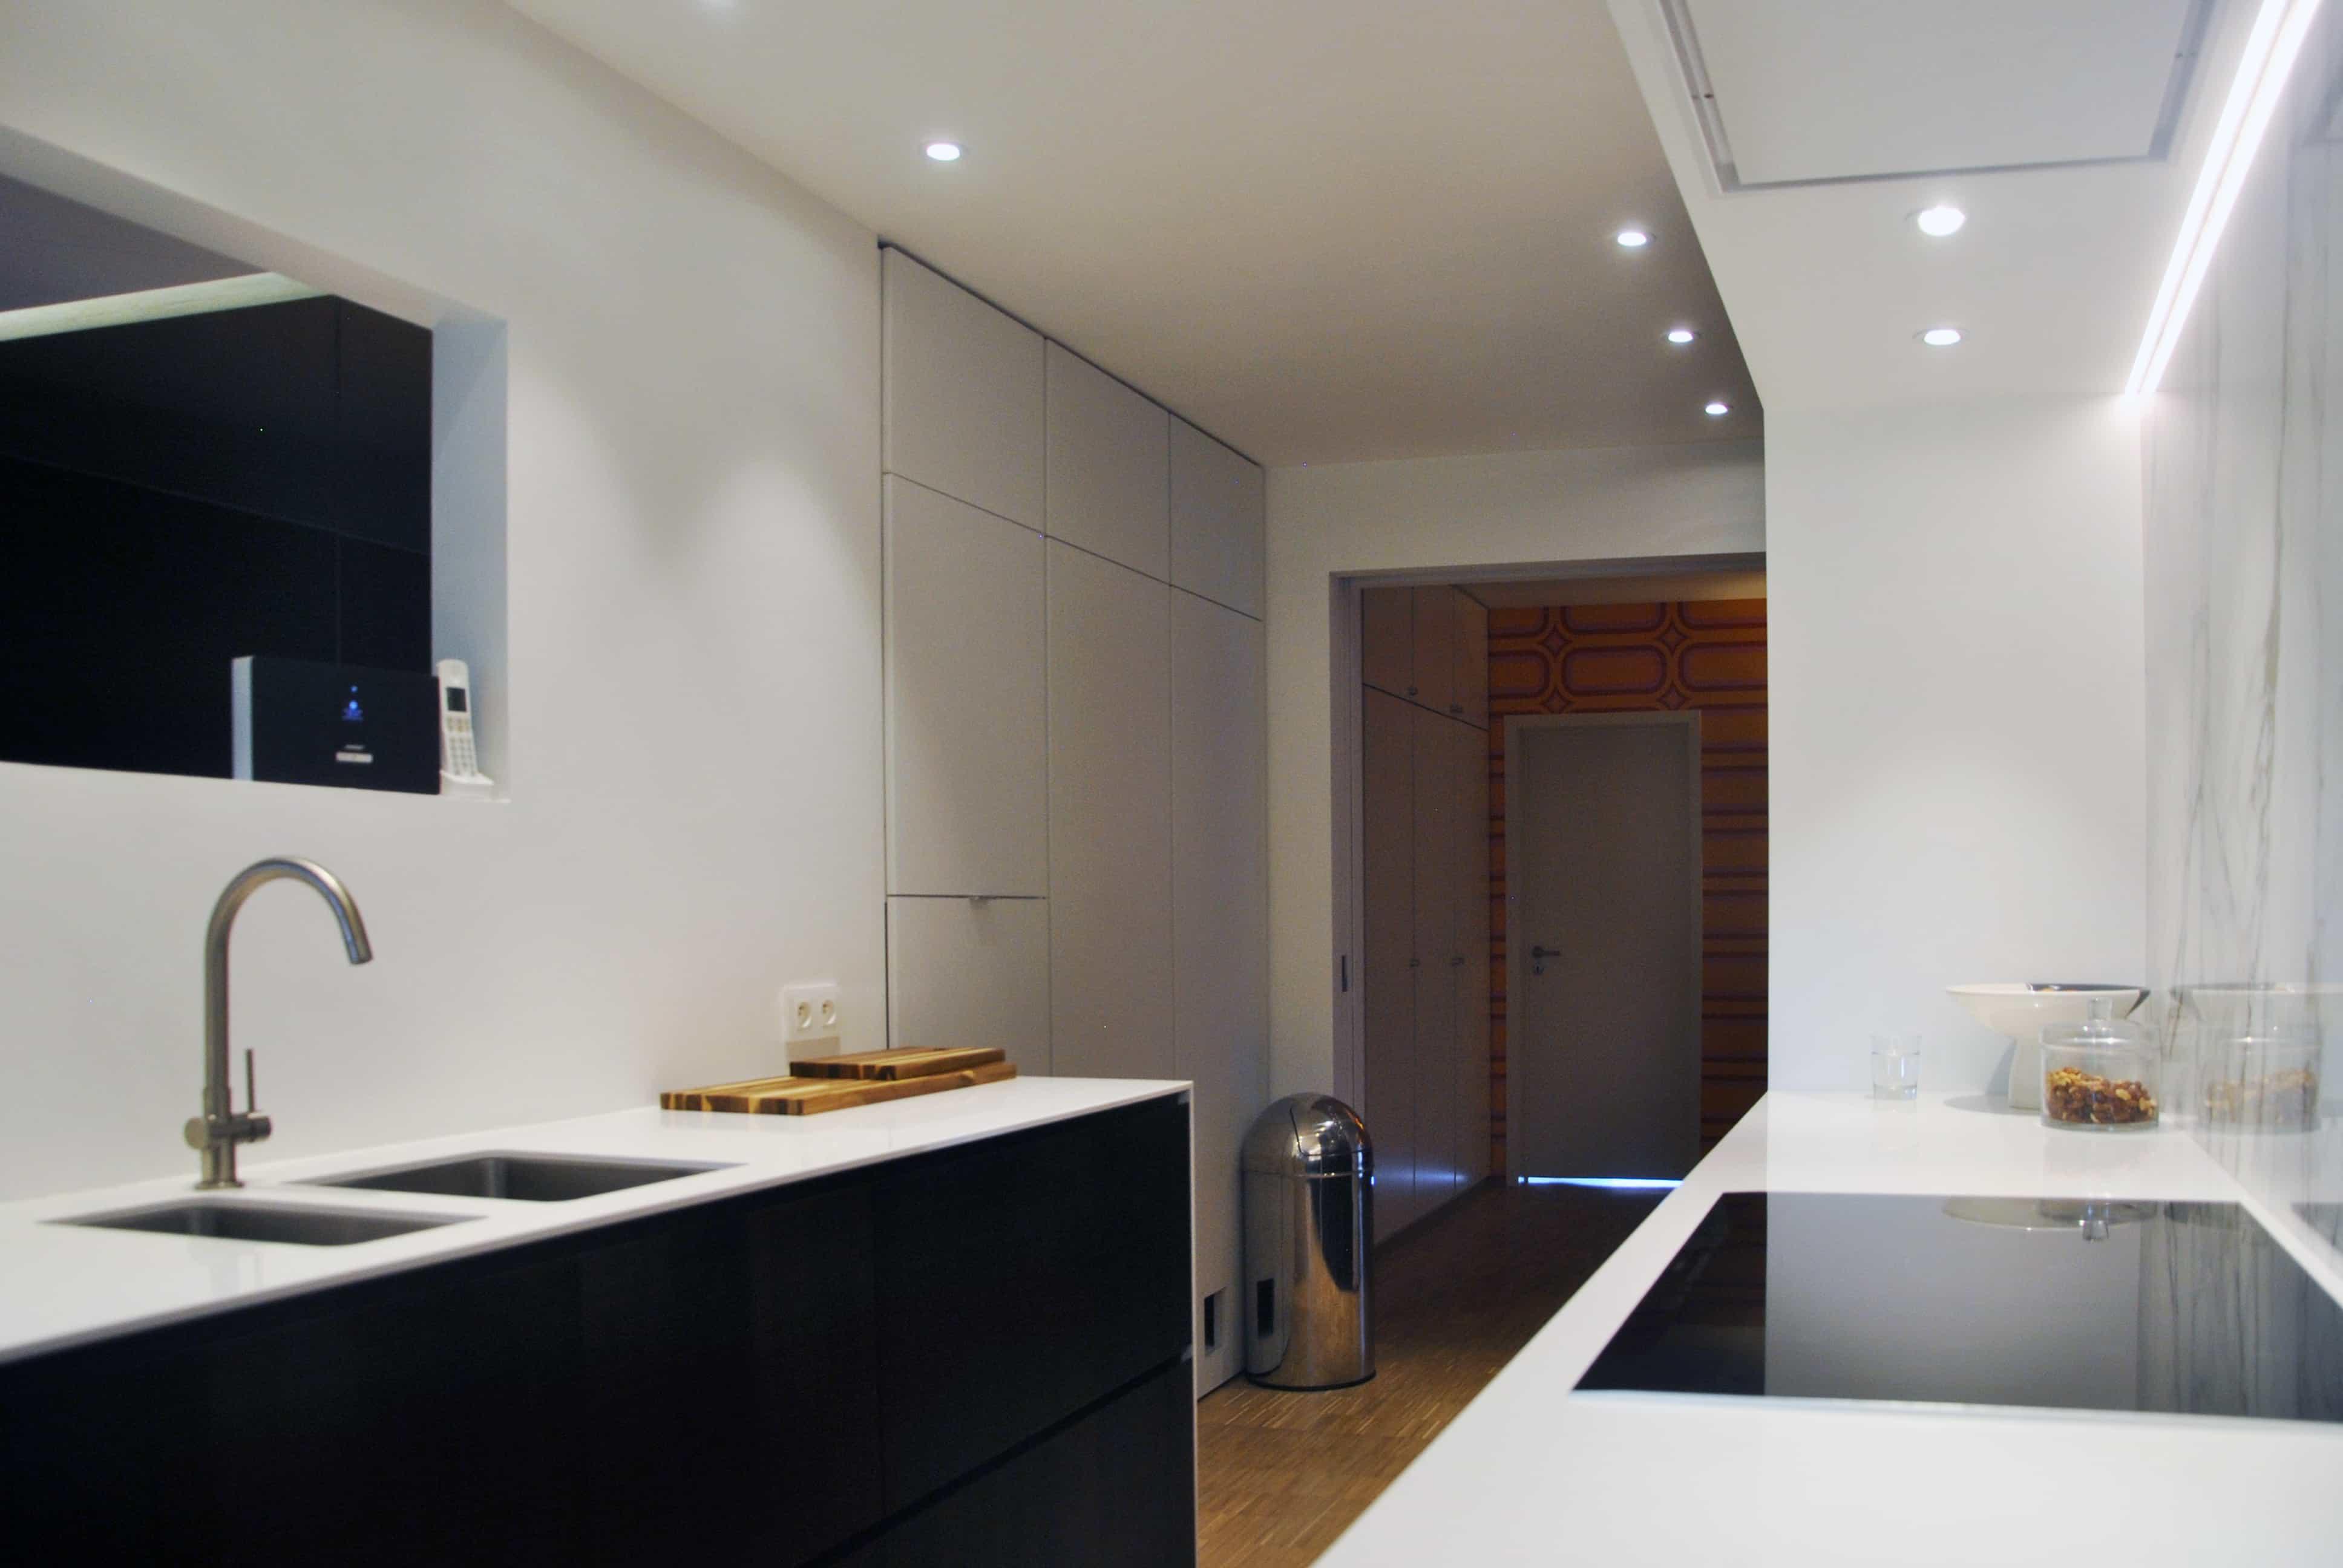 Exclusieve keuken gent dl interieur for Interieur keuken